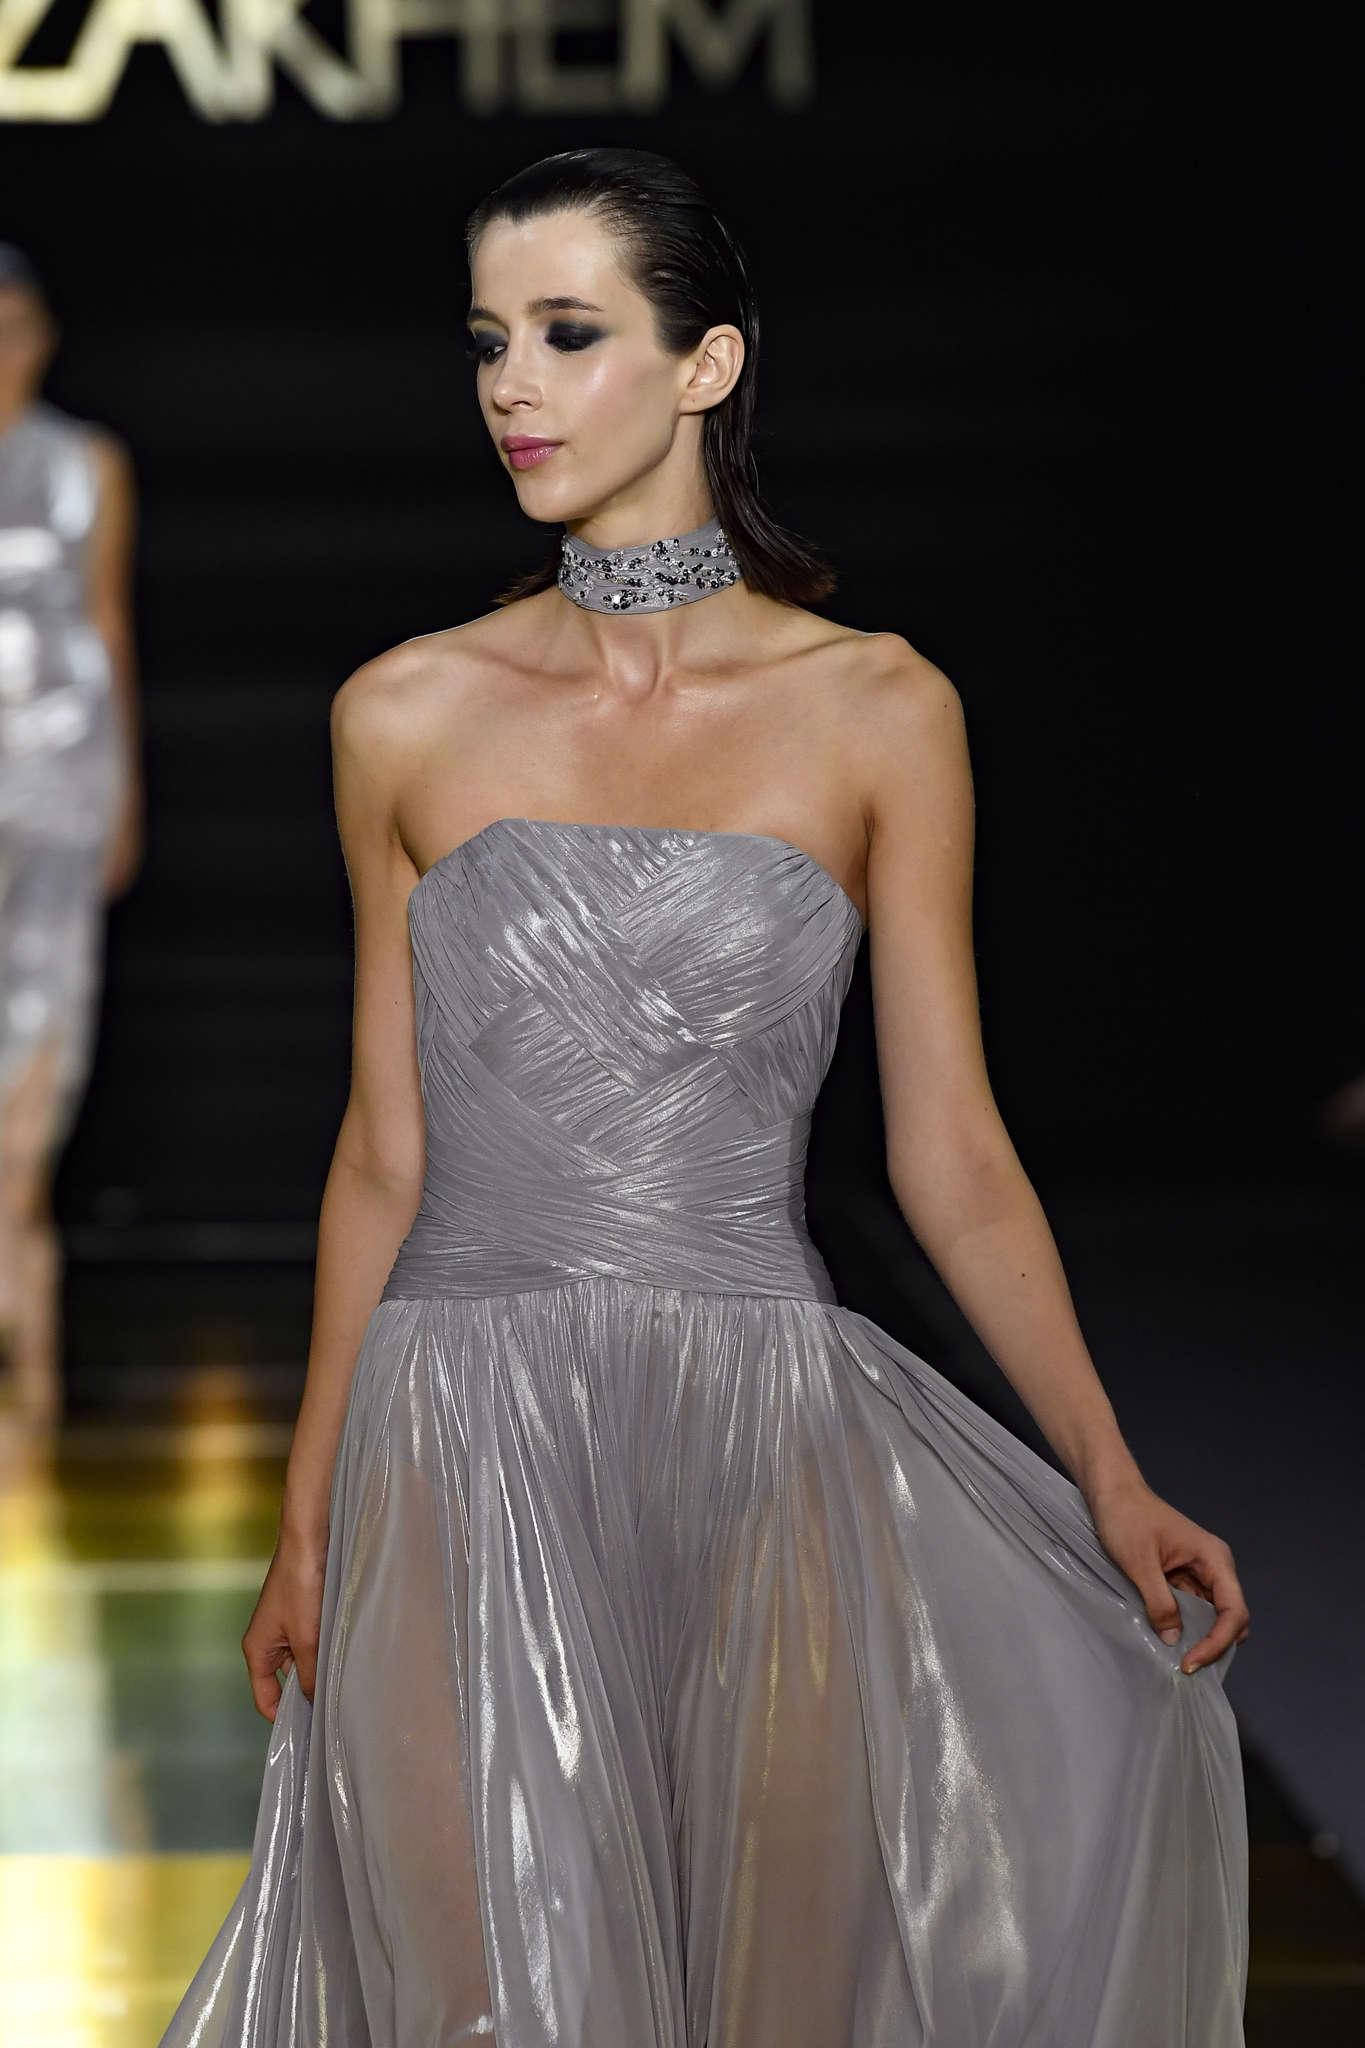 rani zakhem fall winter 2018 haute couture catwalk detail portarte blog .jpg